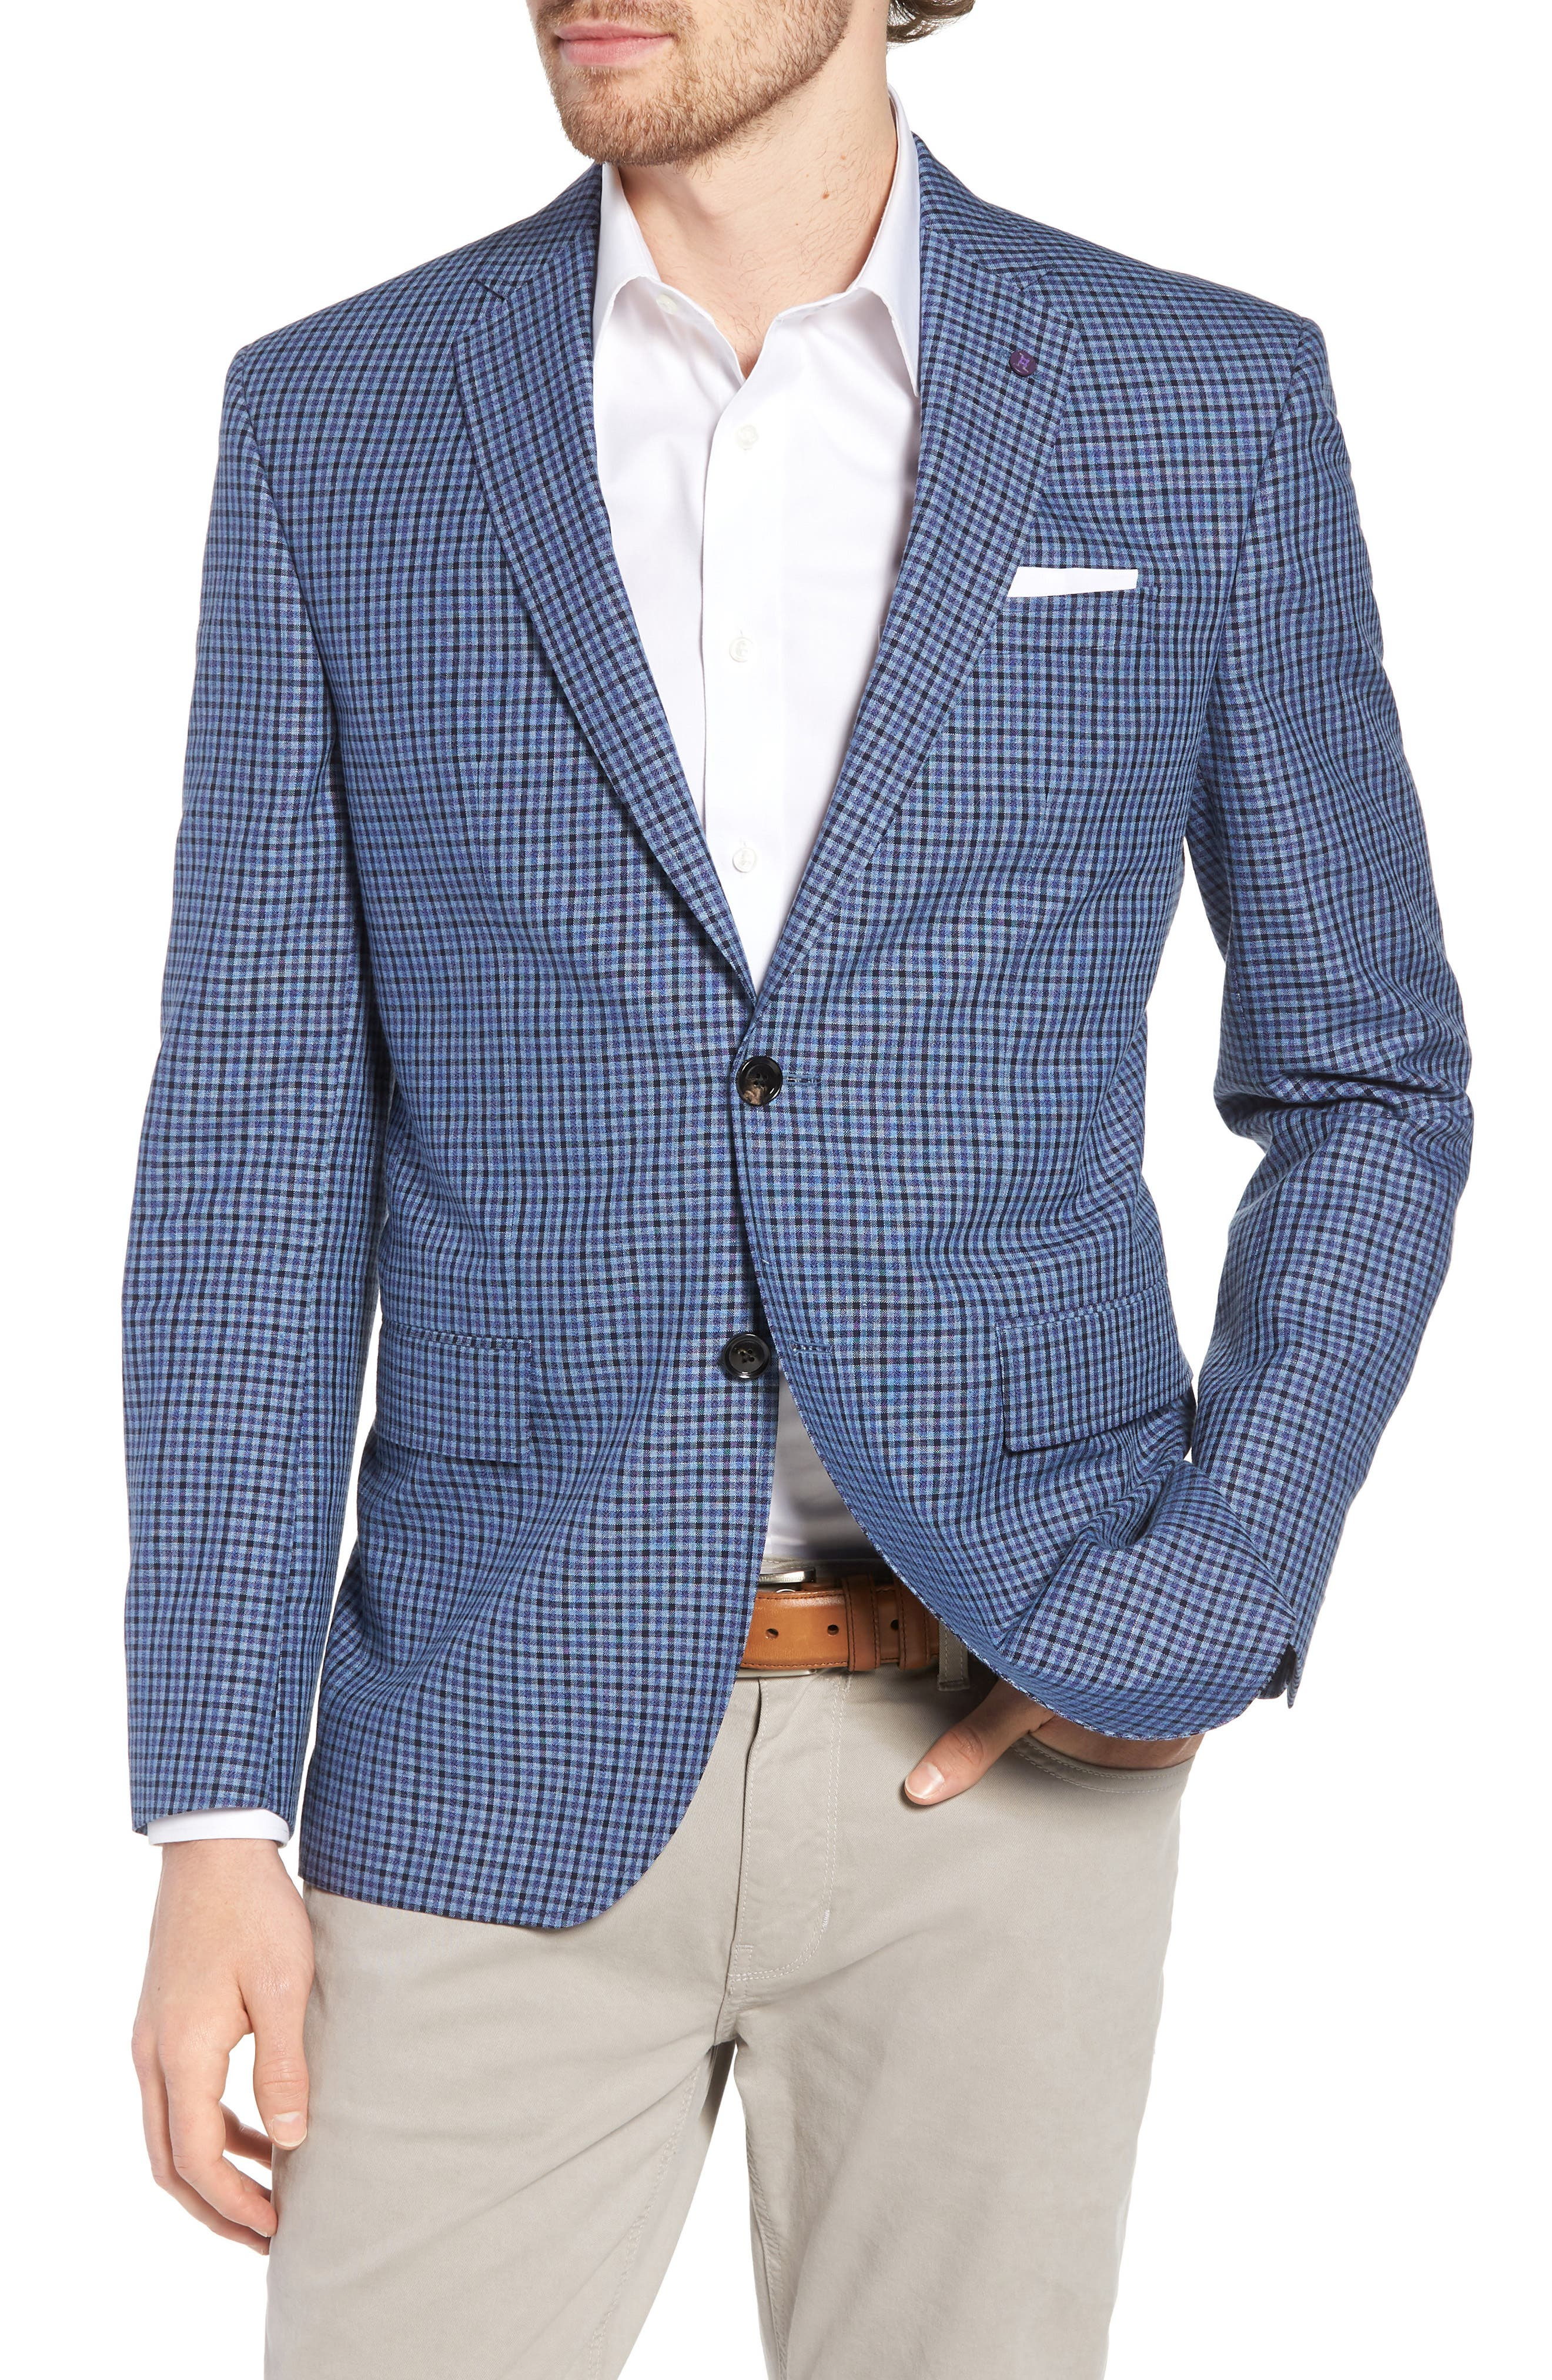 Jay Trim Fit Check Wool & Linen Sport Coat,                         Main,                         color, Blue